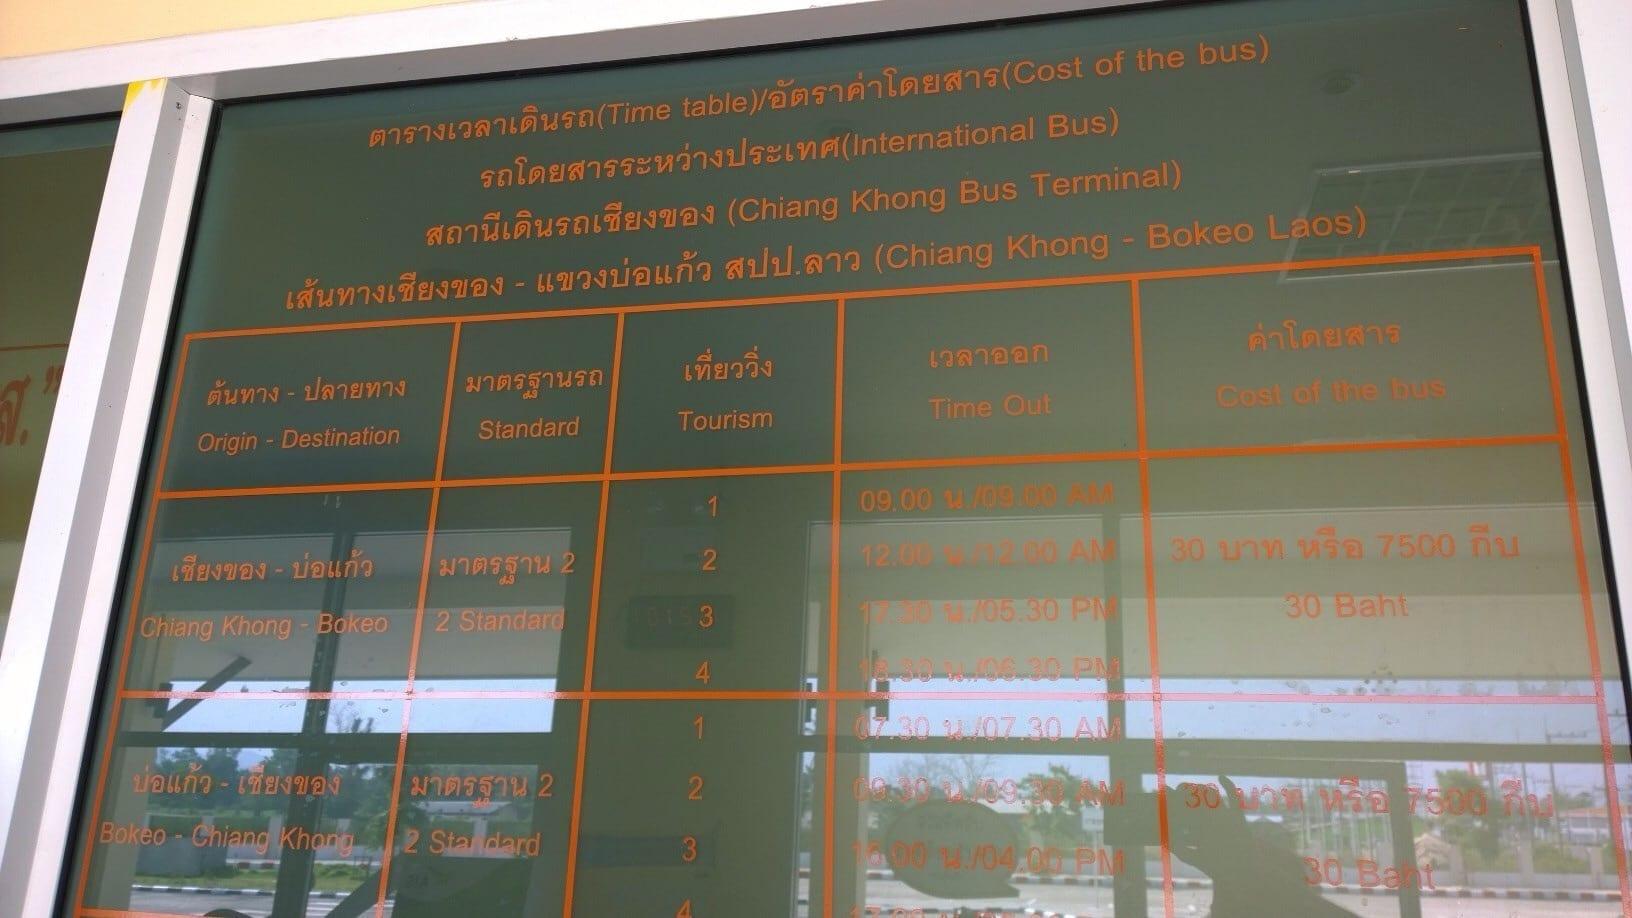 Horario del autobús internacional de la nueva estación de autobuses de Chiang Khong a Huay Xai (Bokeo) Chiang Khong Tailandia